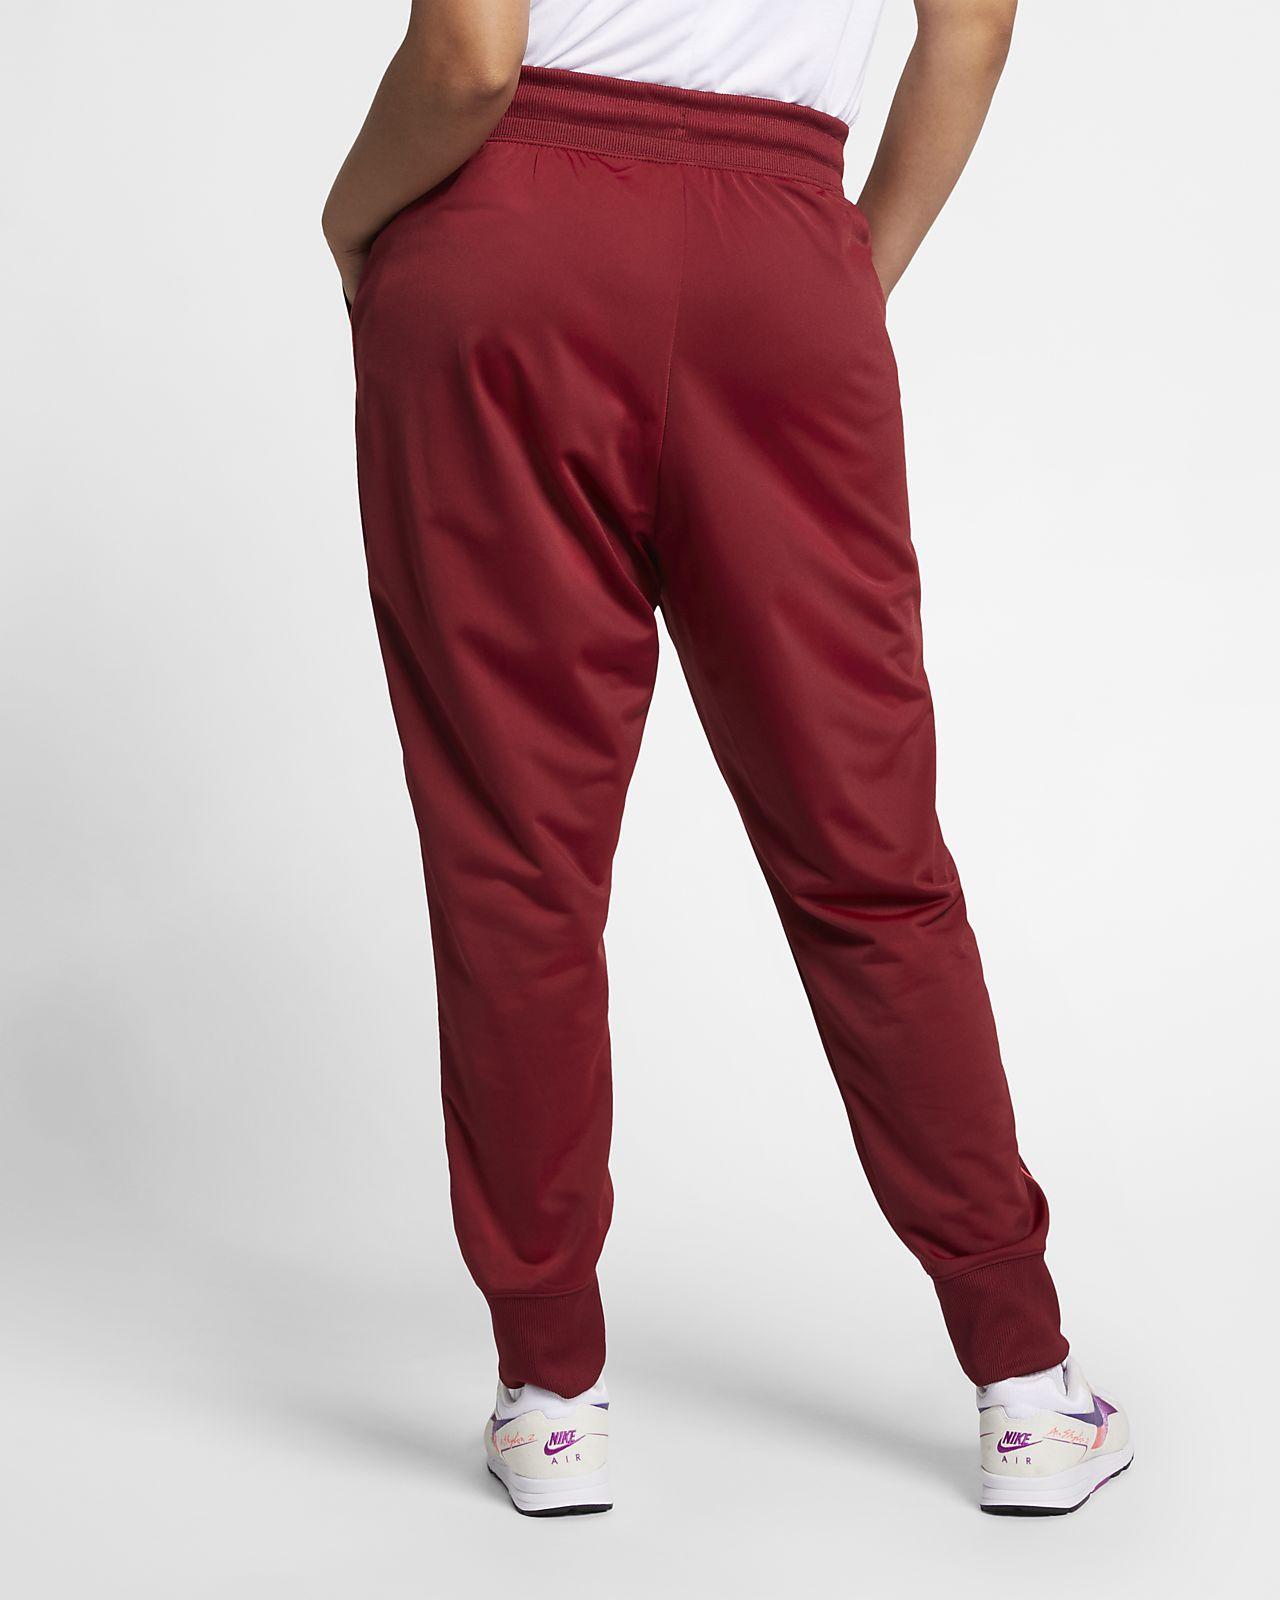 De Pantalon Jogging Femmegrande Sportswear Nike Pour Heritage Taille hQdtrxCBs